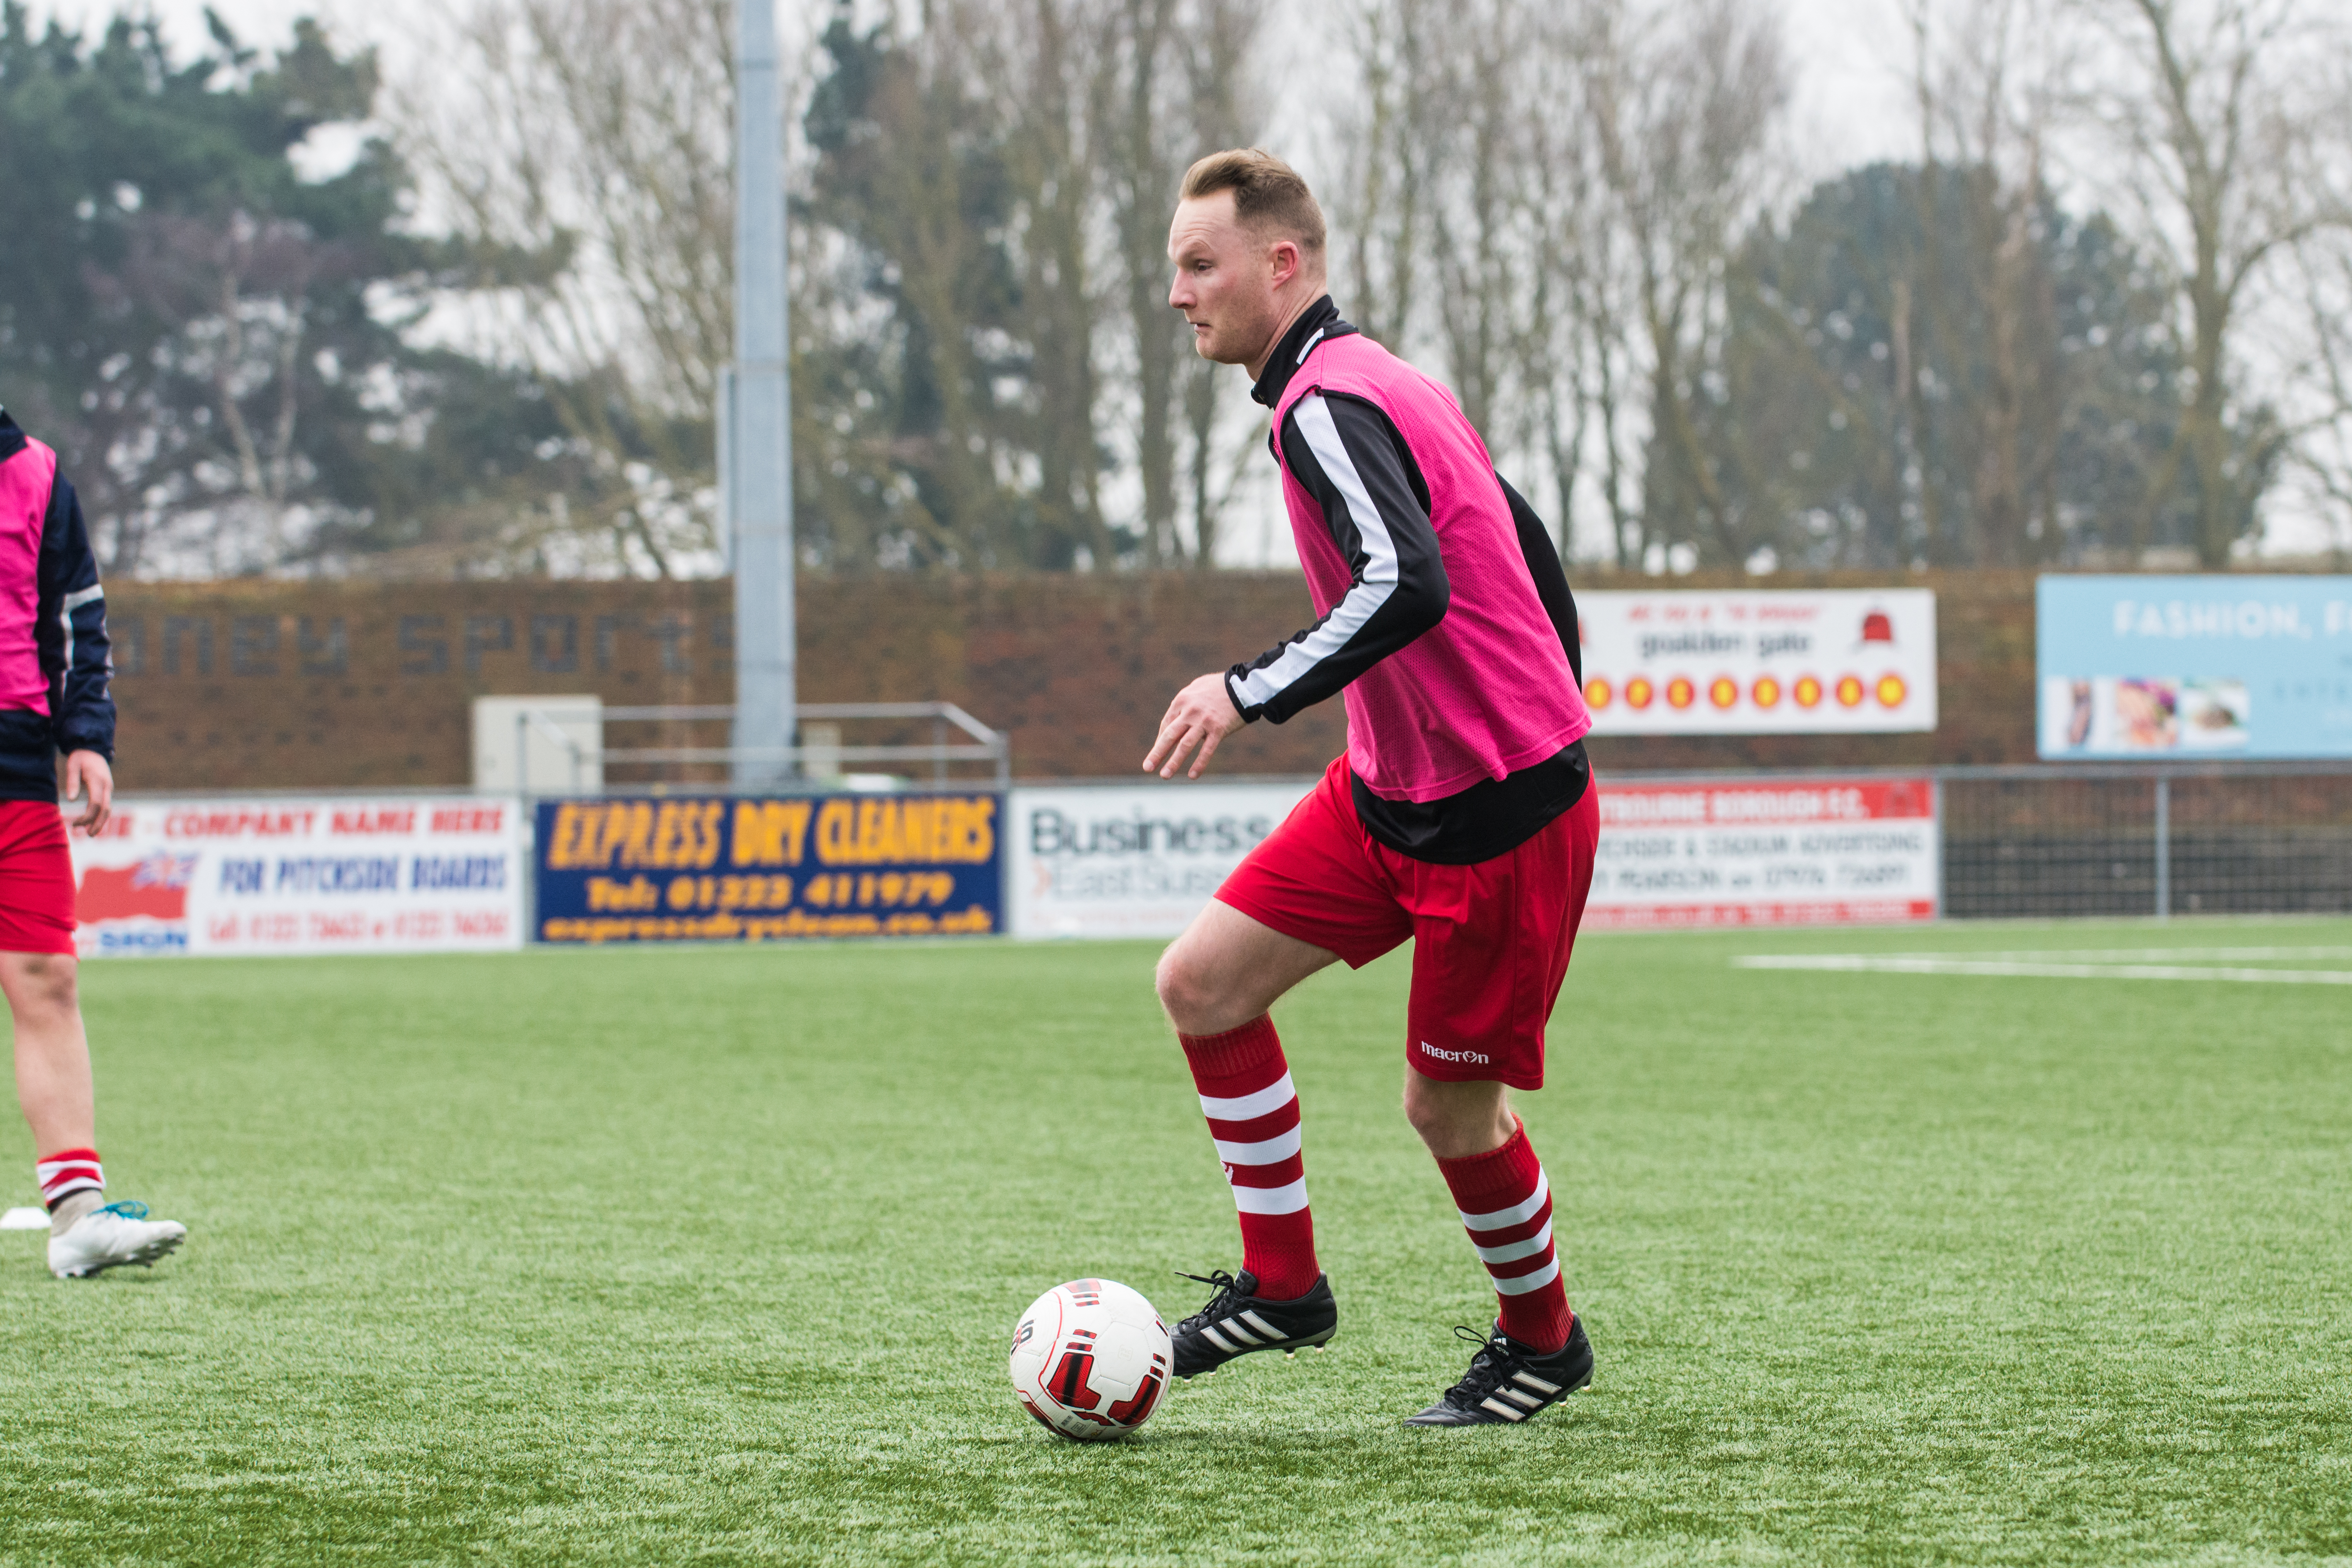 DAVID_JEFFERY Langney Wanderers FC vs Bexhill United FC 03.03.18 16